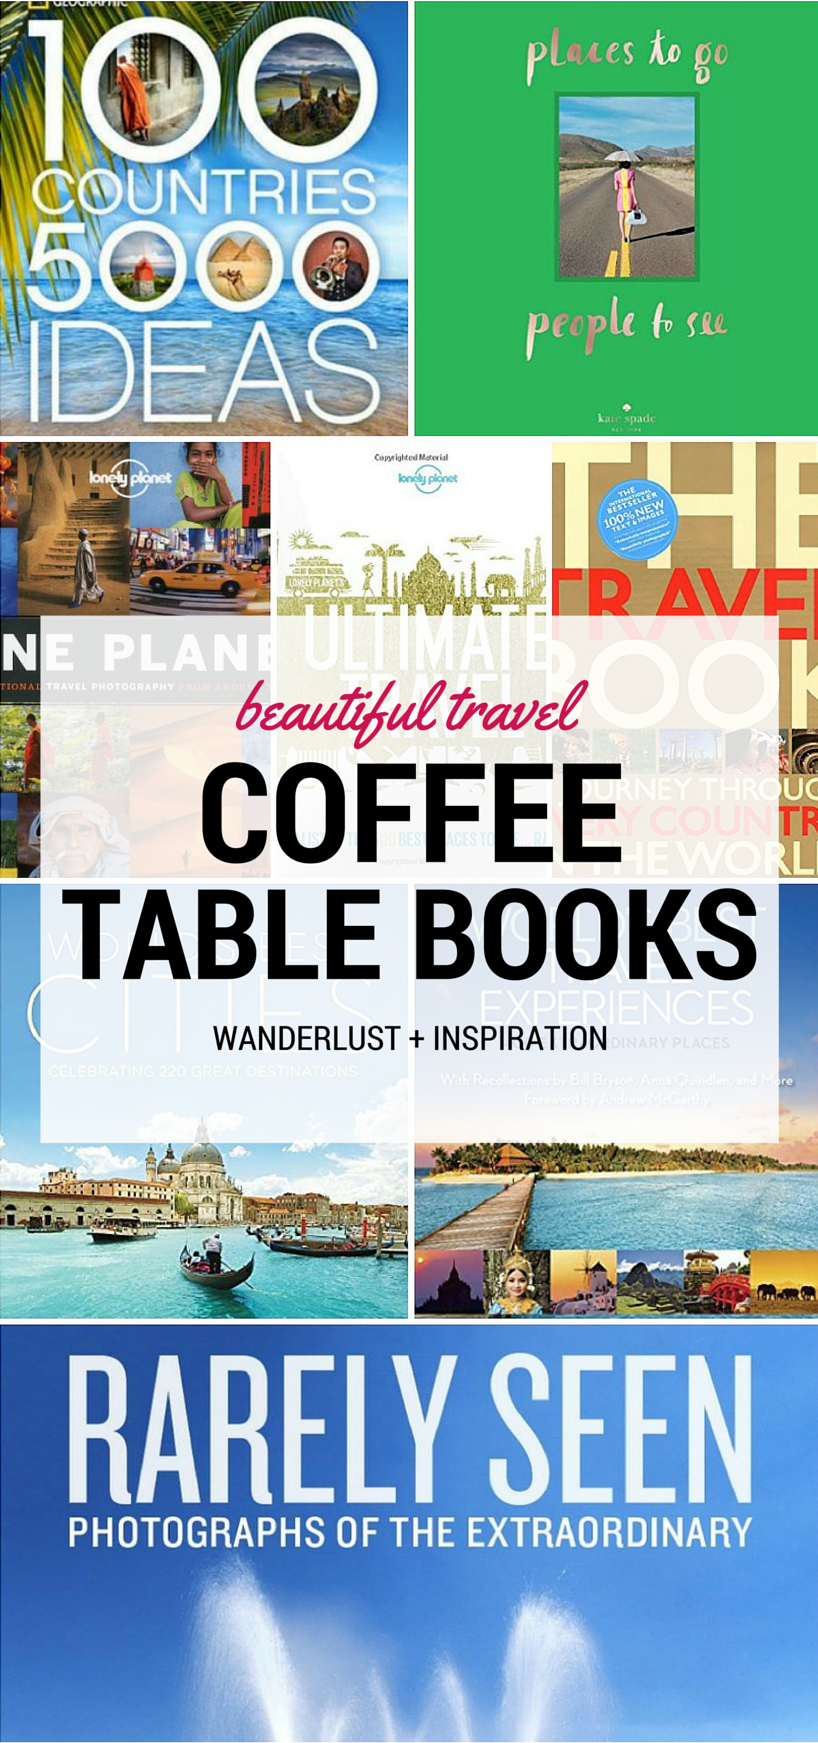 16 Beautiful Travel Coffee Table Books